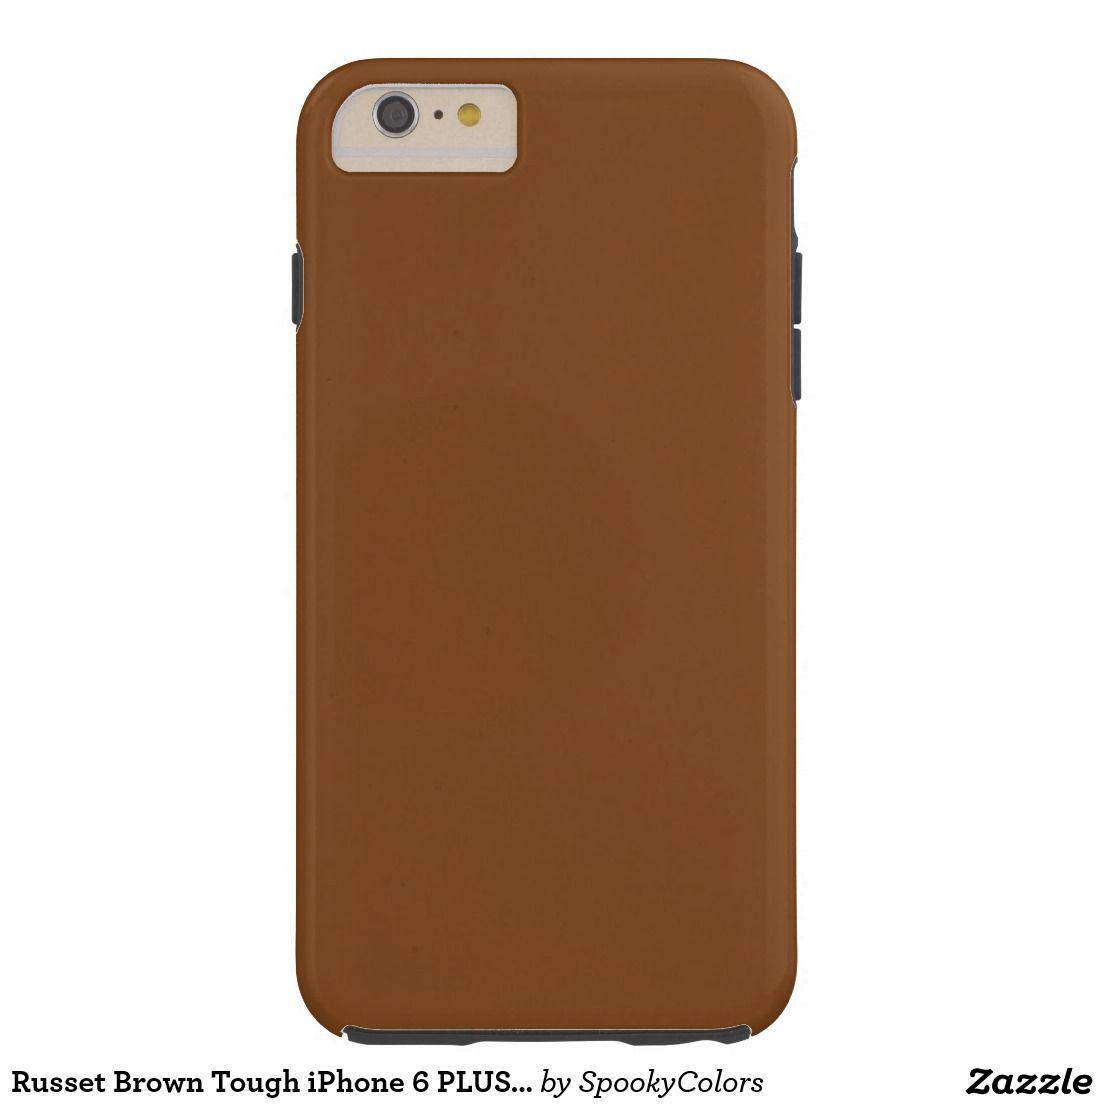 Russet Brown Tough iPhone 6 PLUS Case